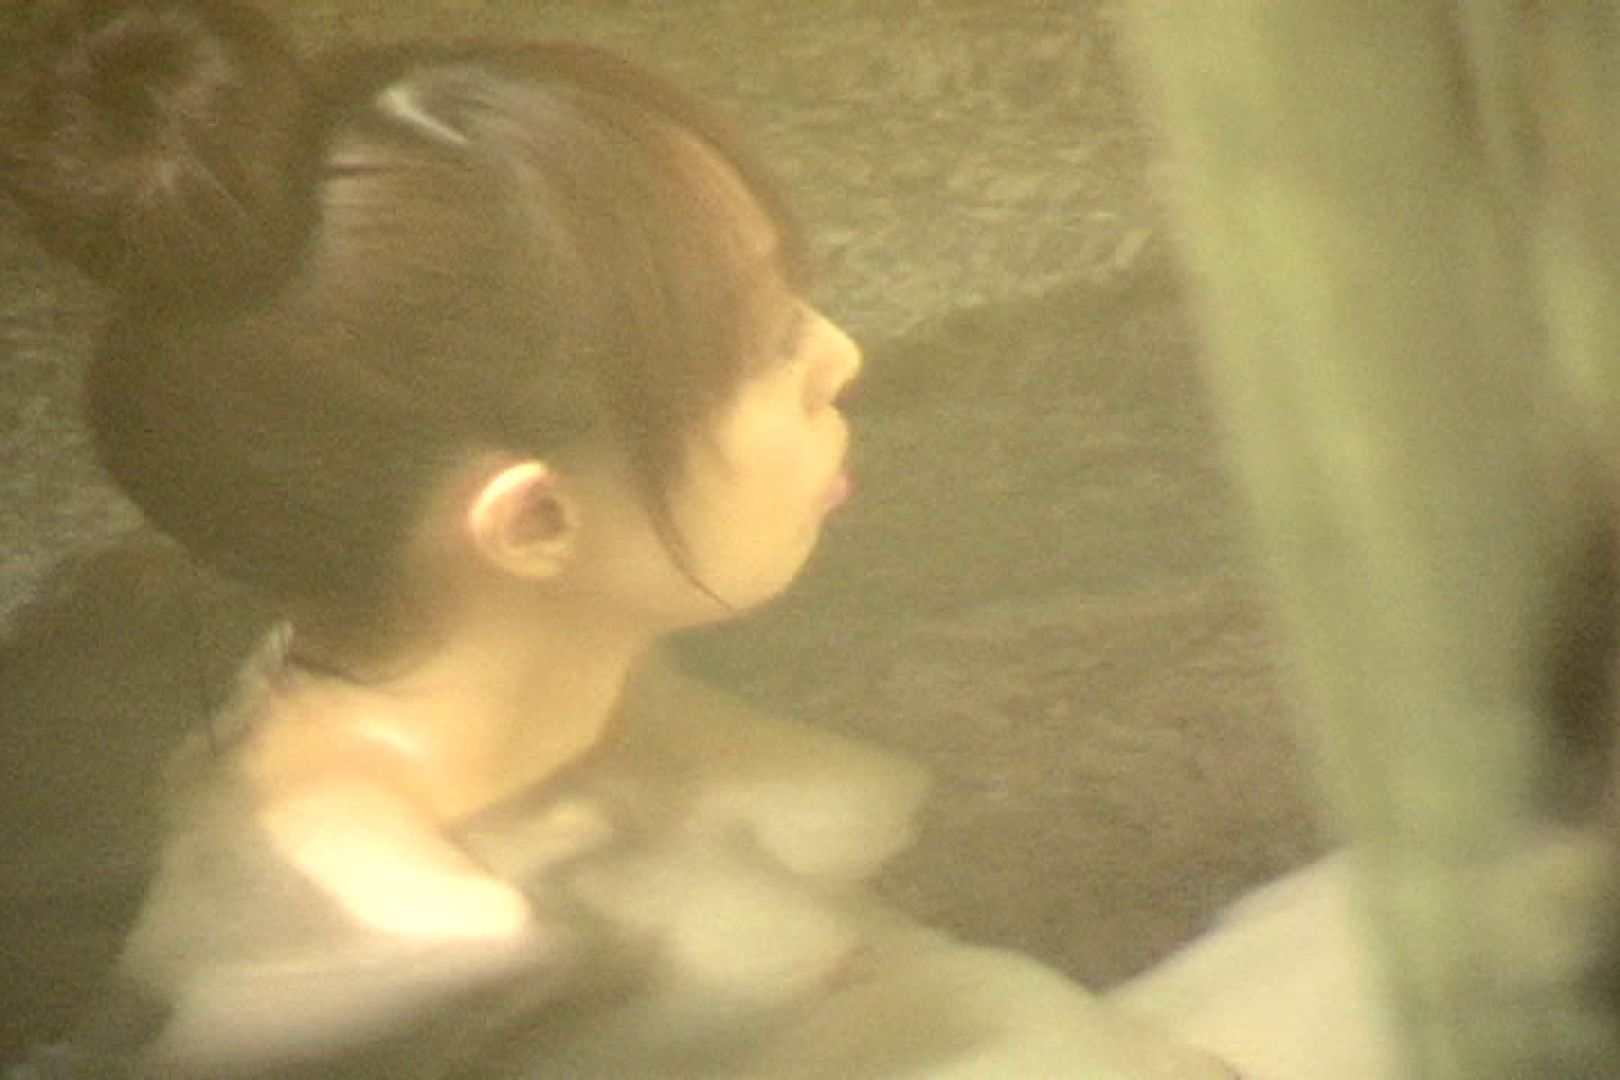 No.16 細身妊婦の膨らんだお腹とオッパイ 露天入浴 オマンコ無修正動画無料 91枚 51